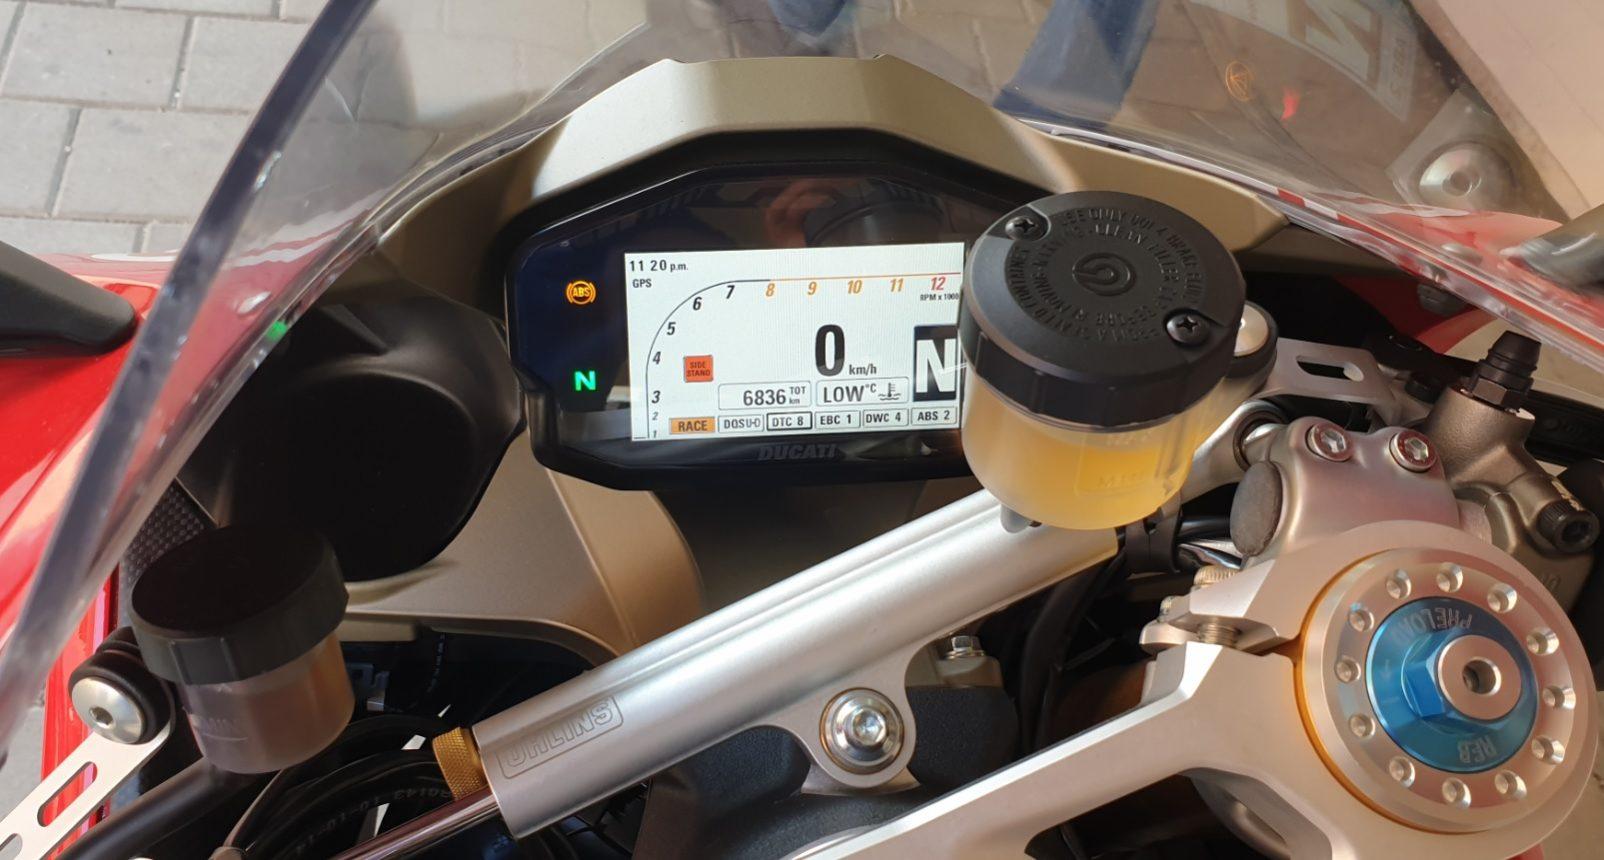 Ducati Panigale 1199 R full